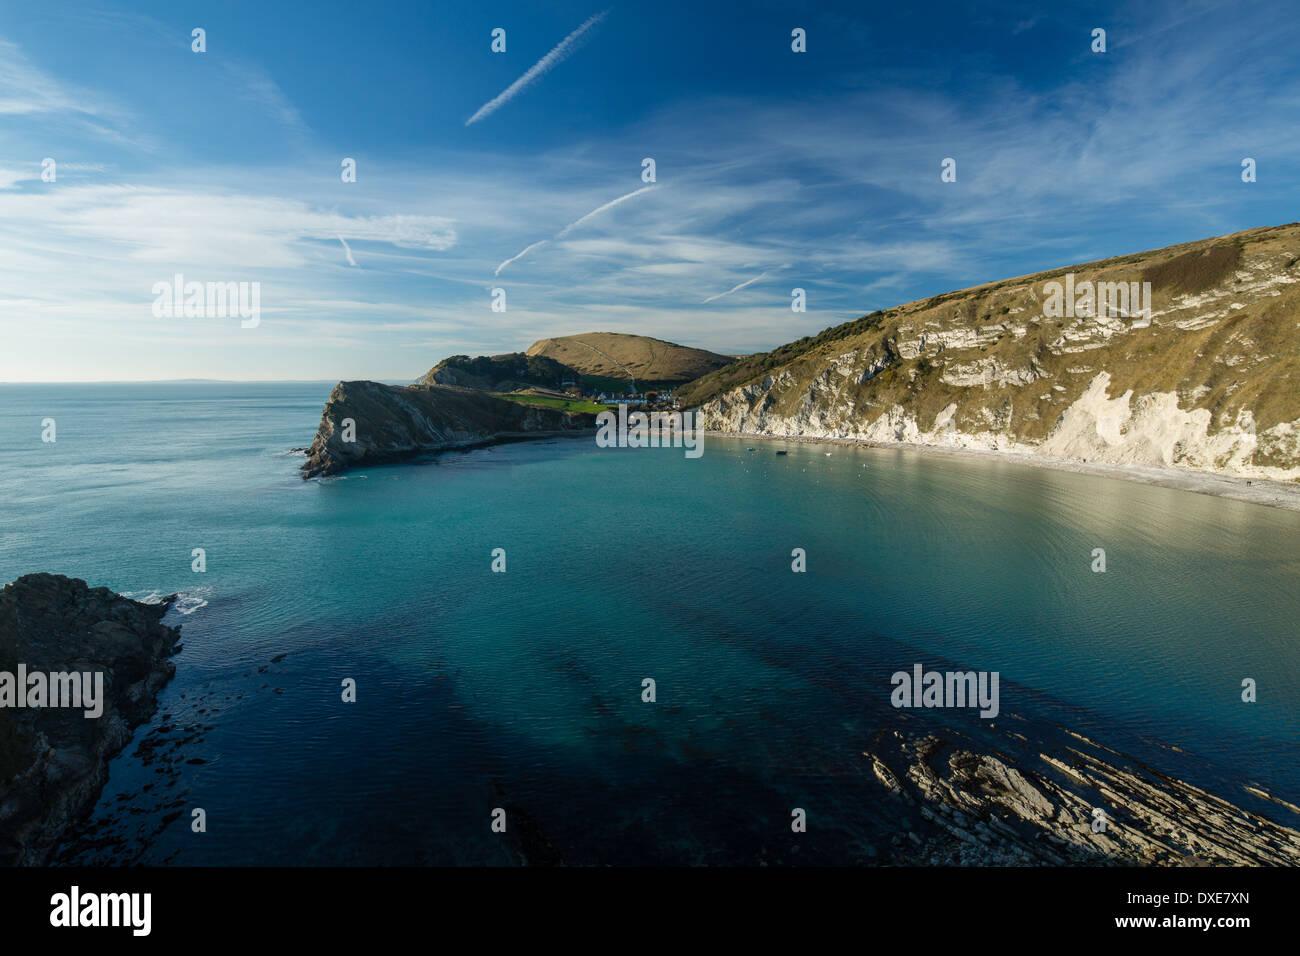 Lulworth Cove, Jurassic Coast, Dorset, England - Stock Image